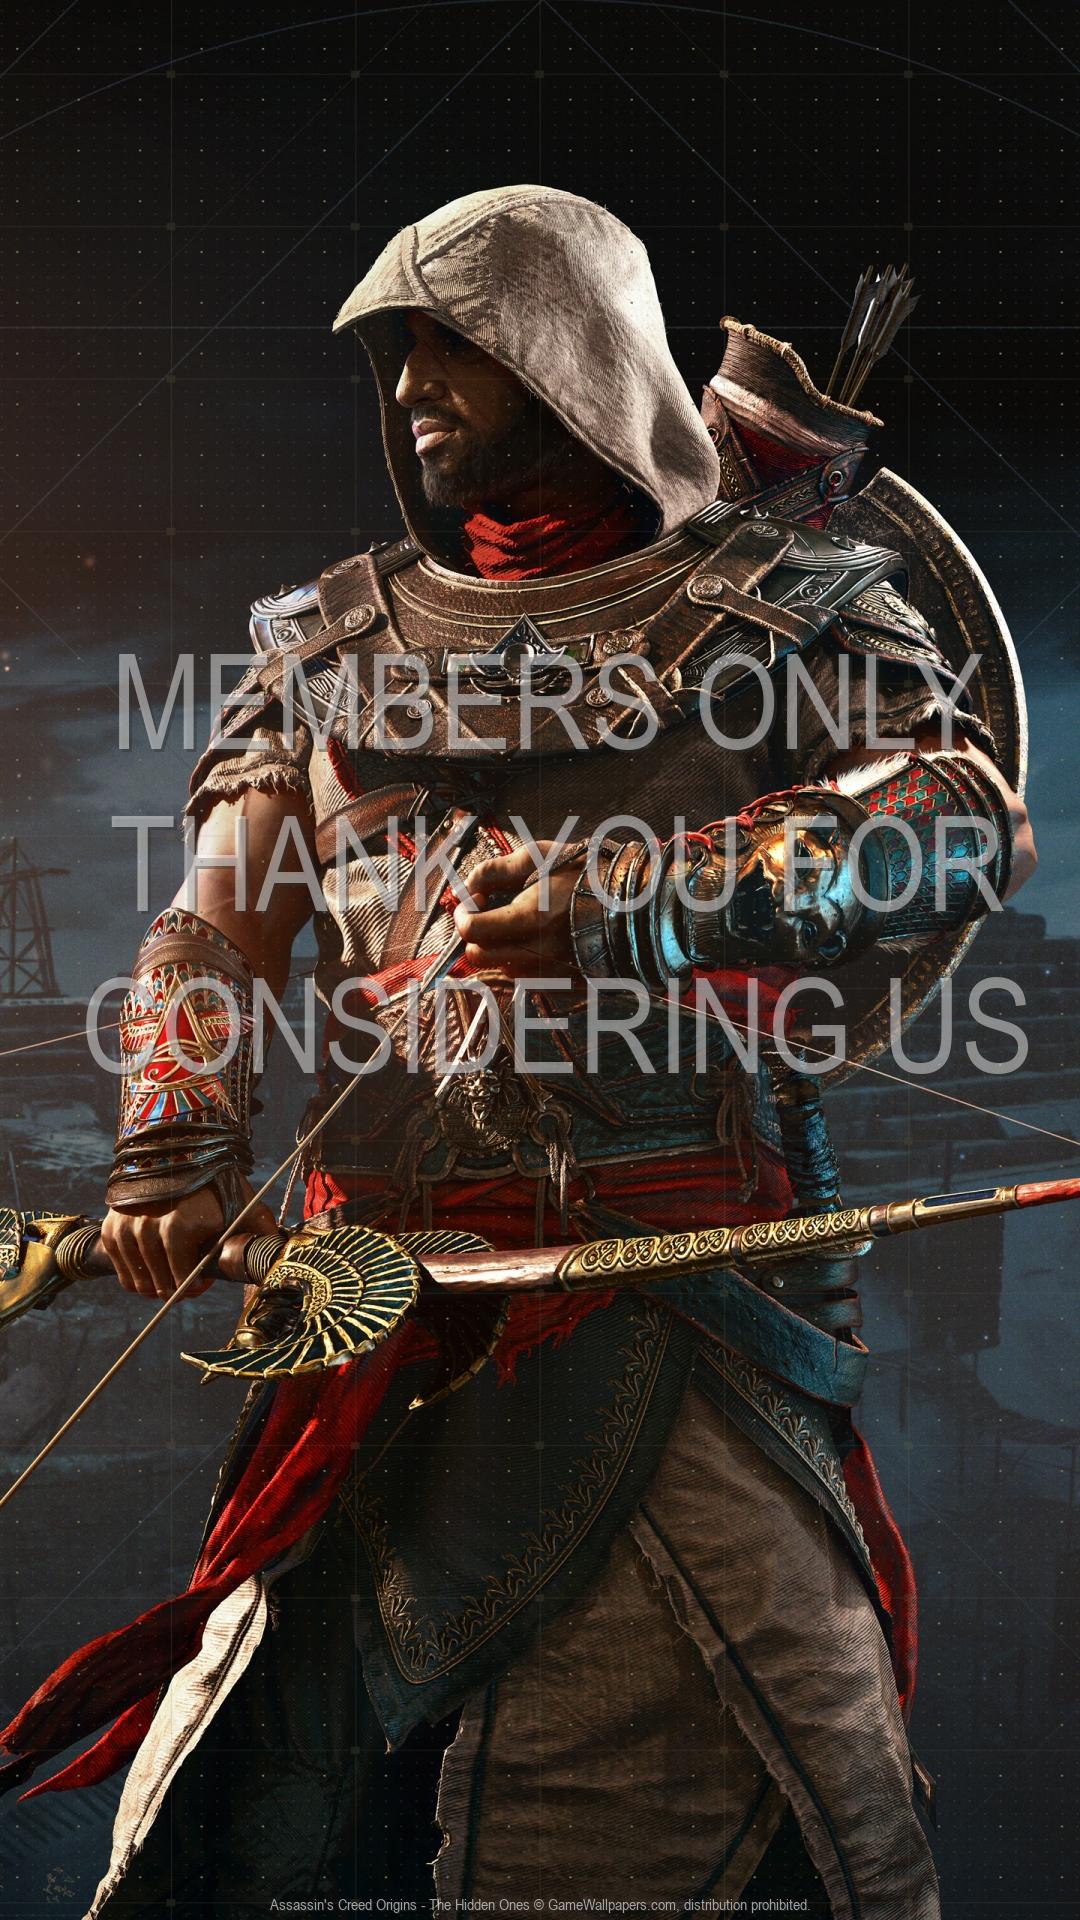 Assassin's Creed: Origins - The Hidden Ones 1920x1080 Mobiele achtergrond 01